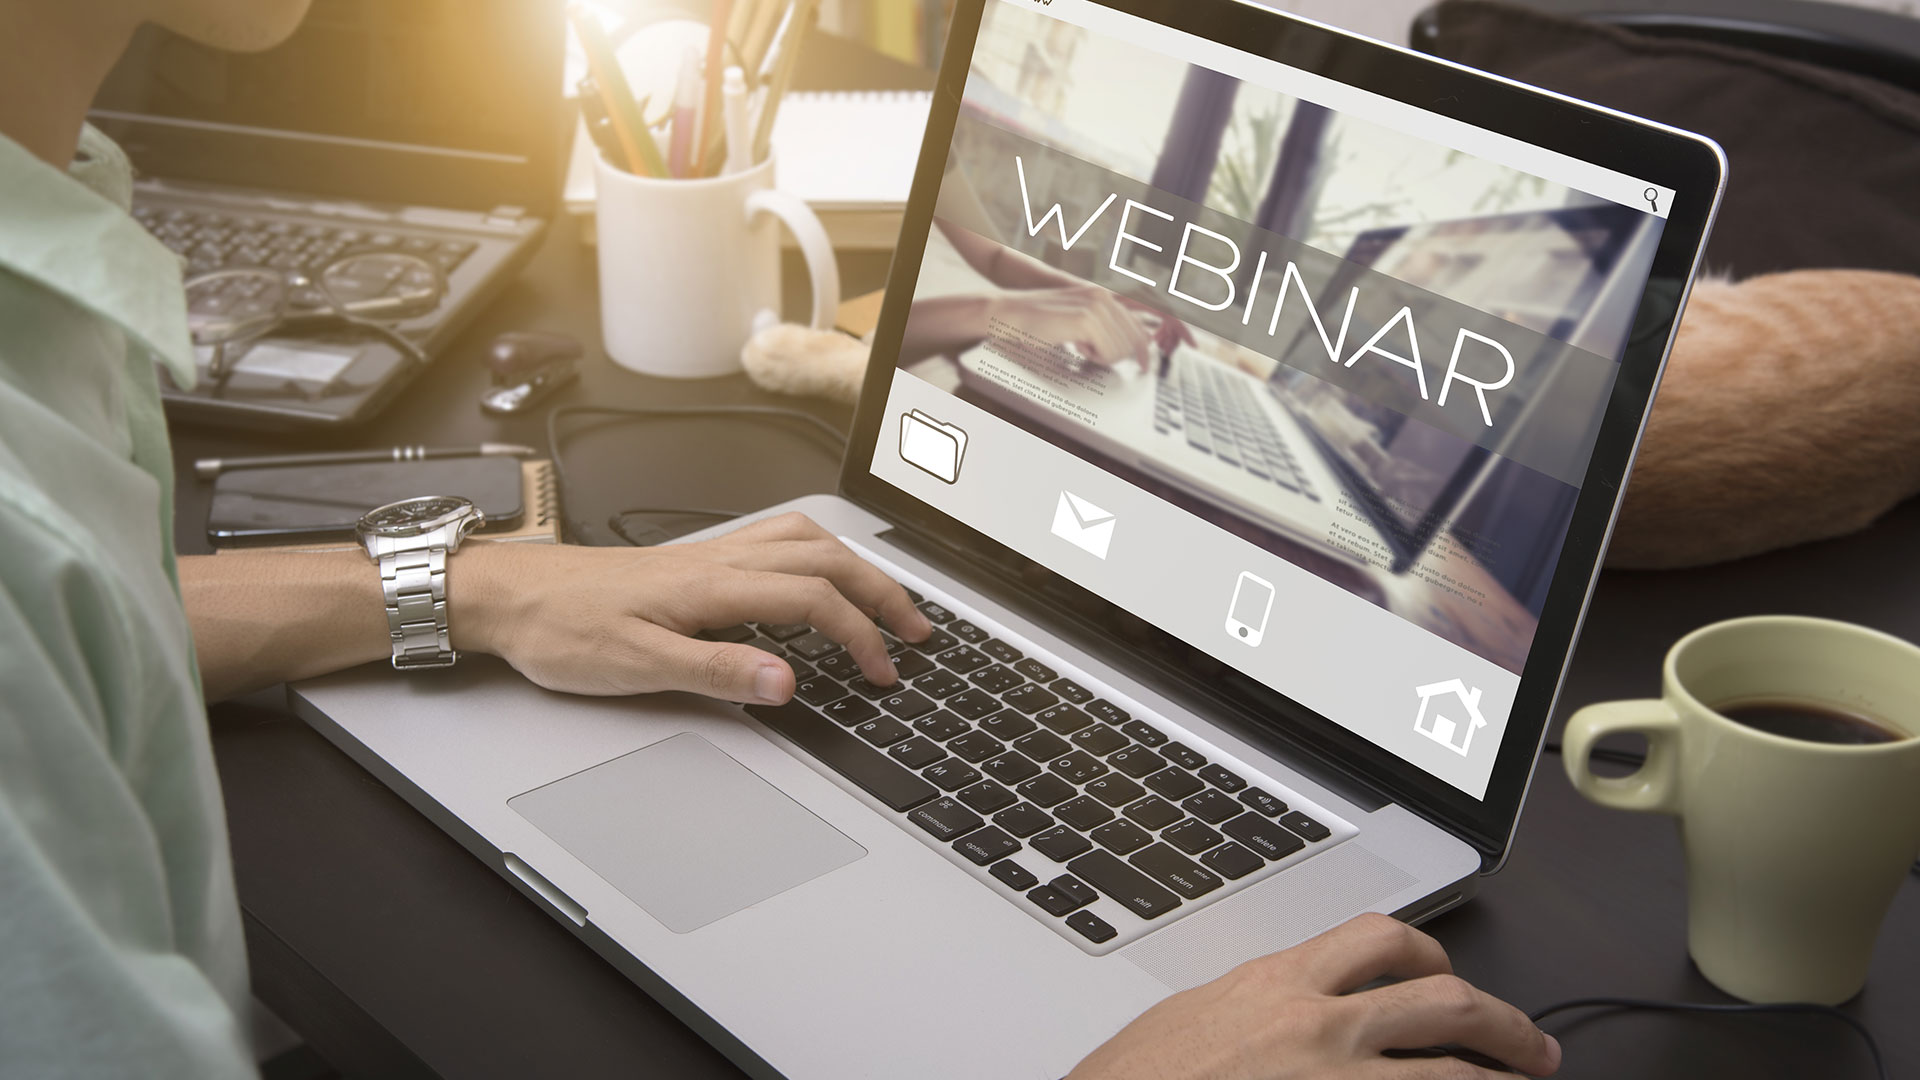 Virtuelle Veranstaltung: Webinar, Konferenz oder Hybrid Event